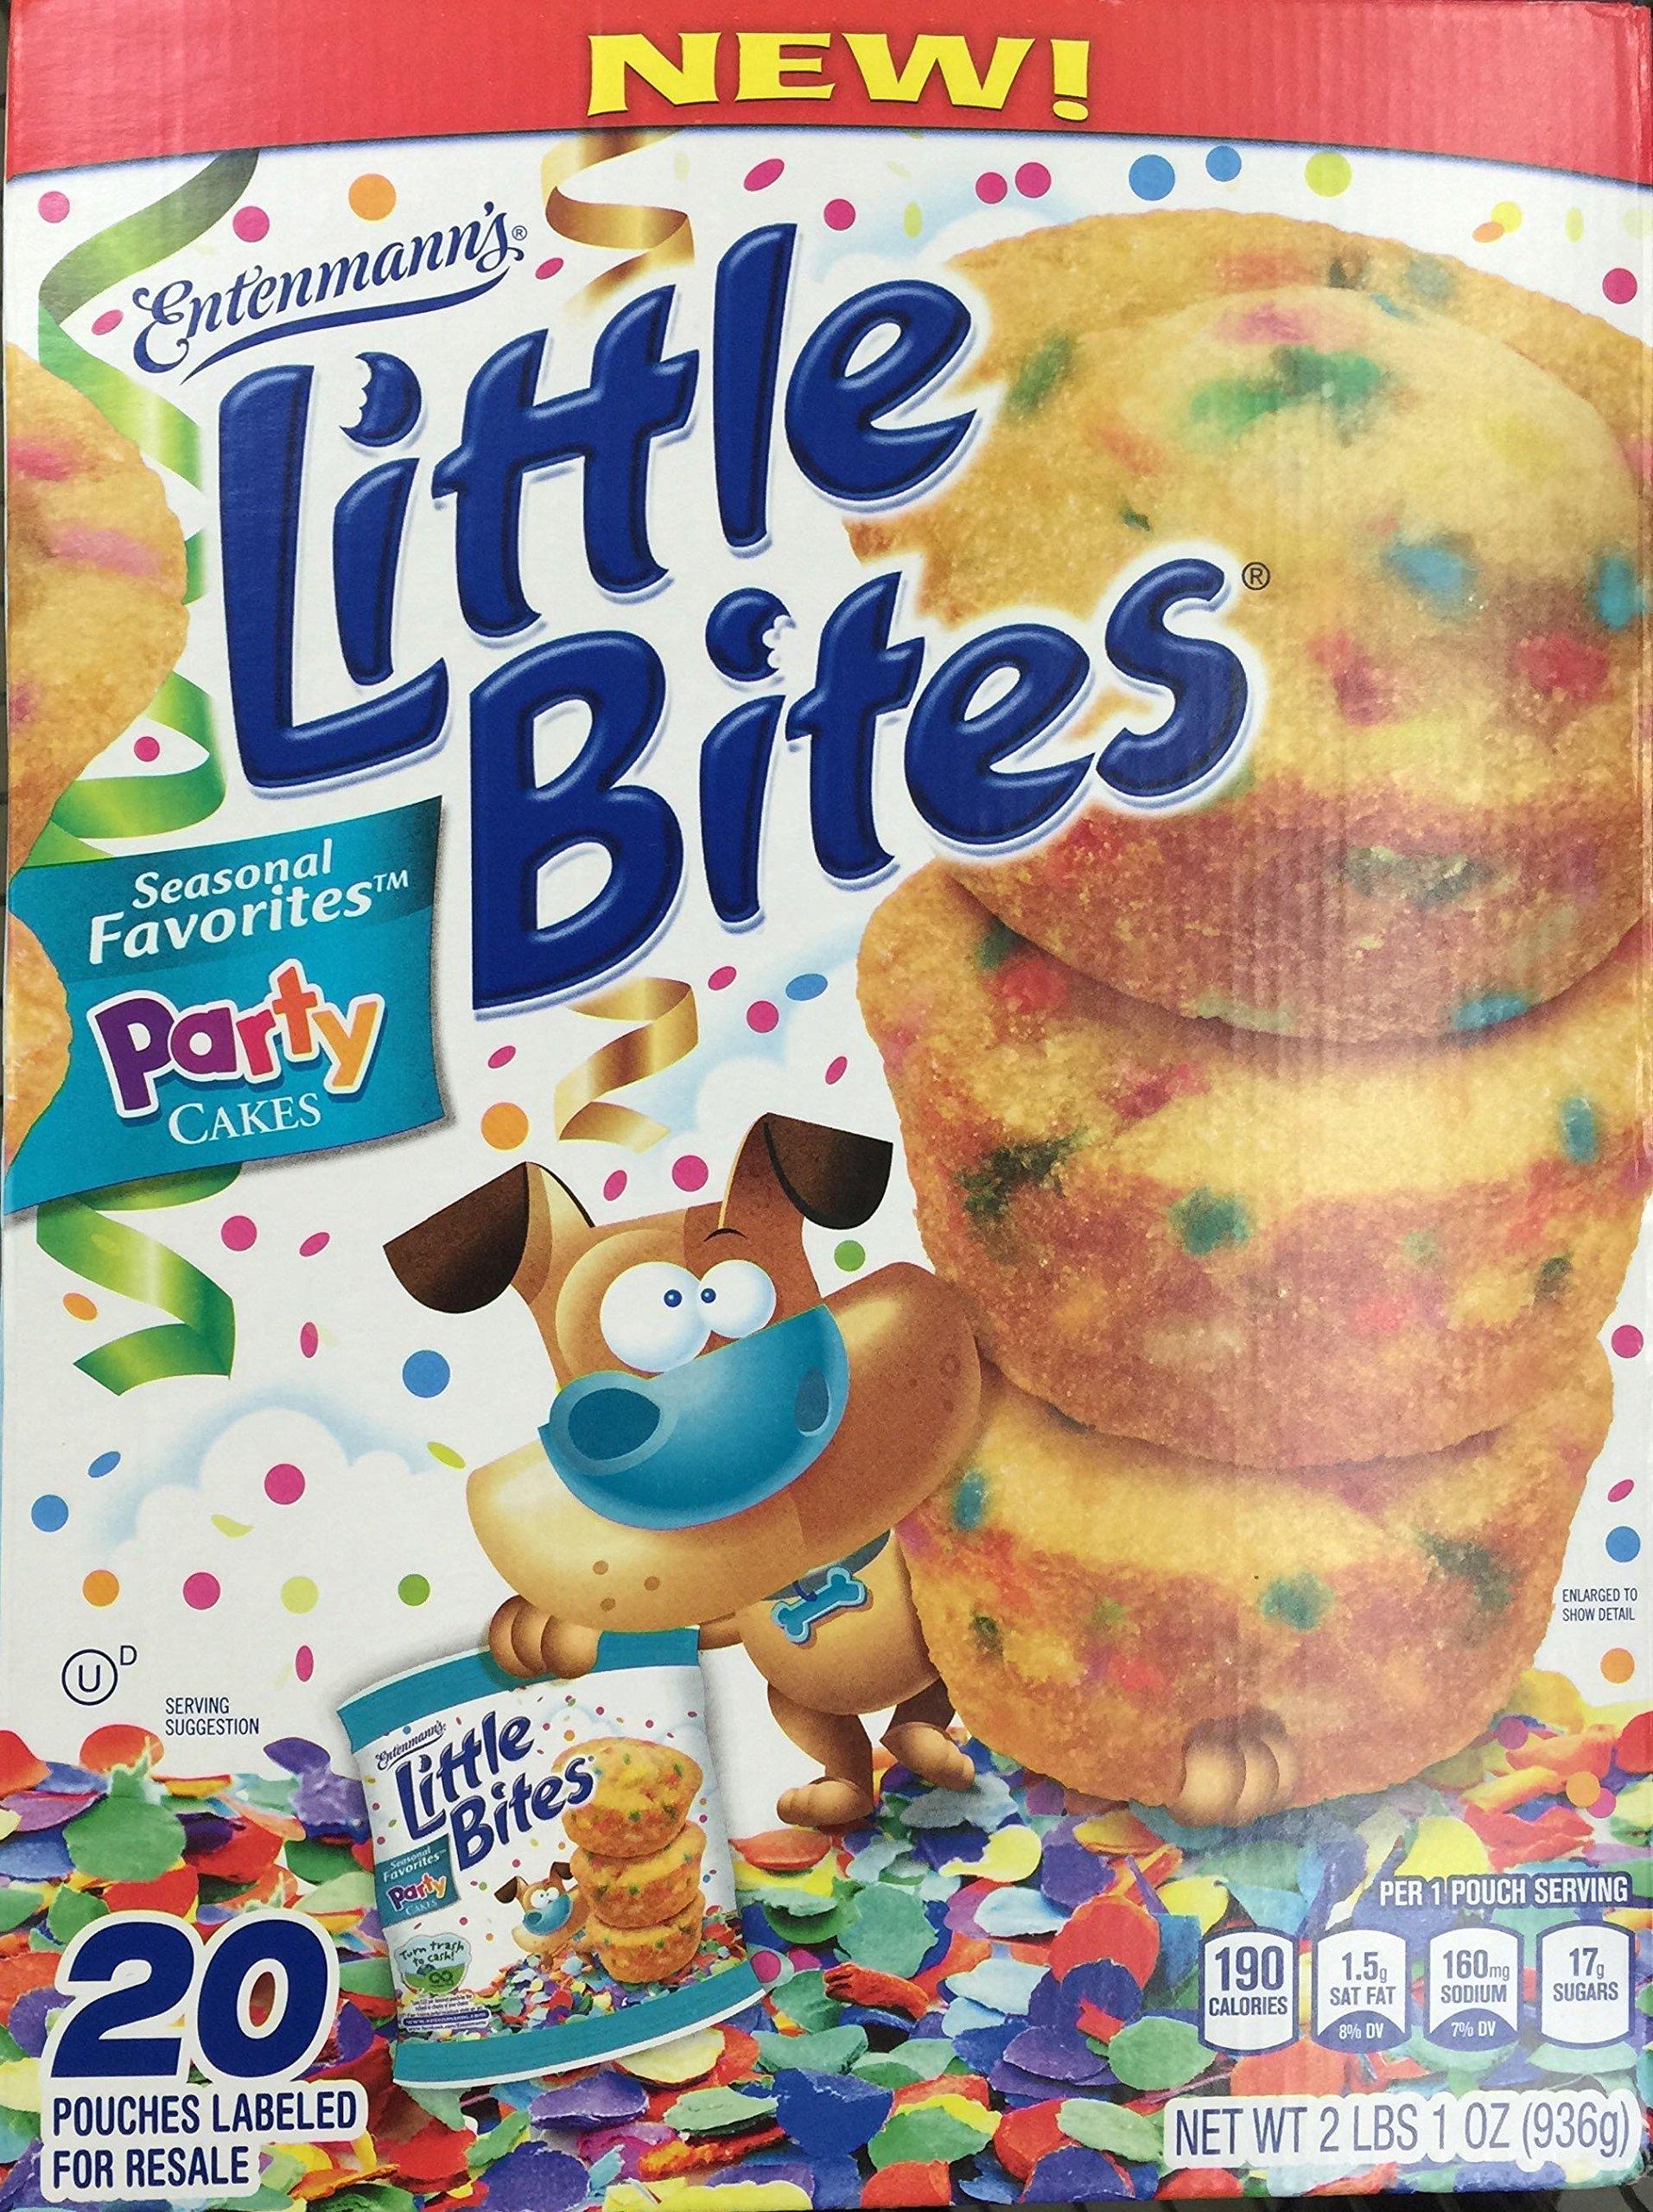 Entenmann's Little Bites Seasonal Favorites Party Cakes 20 Pouches - 2 lbs. 1 oz. by Entenmann's Little Bites (Image #1)